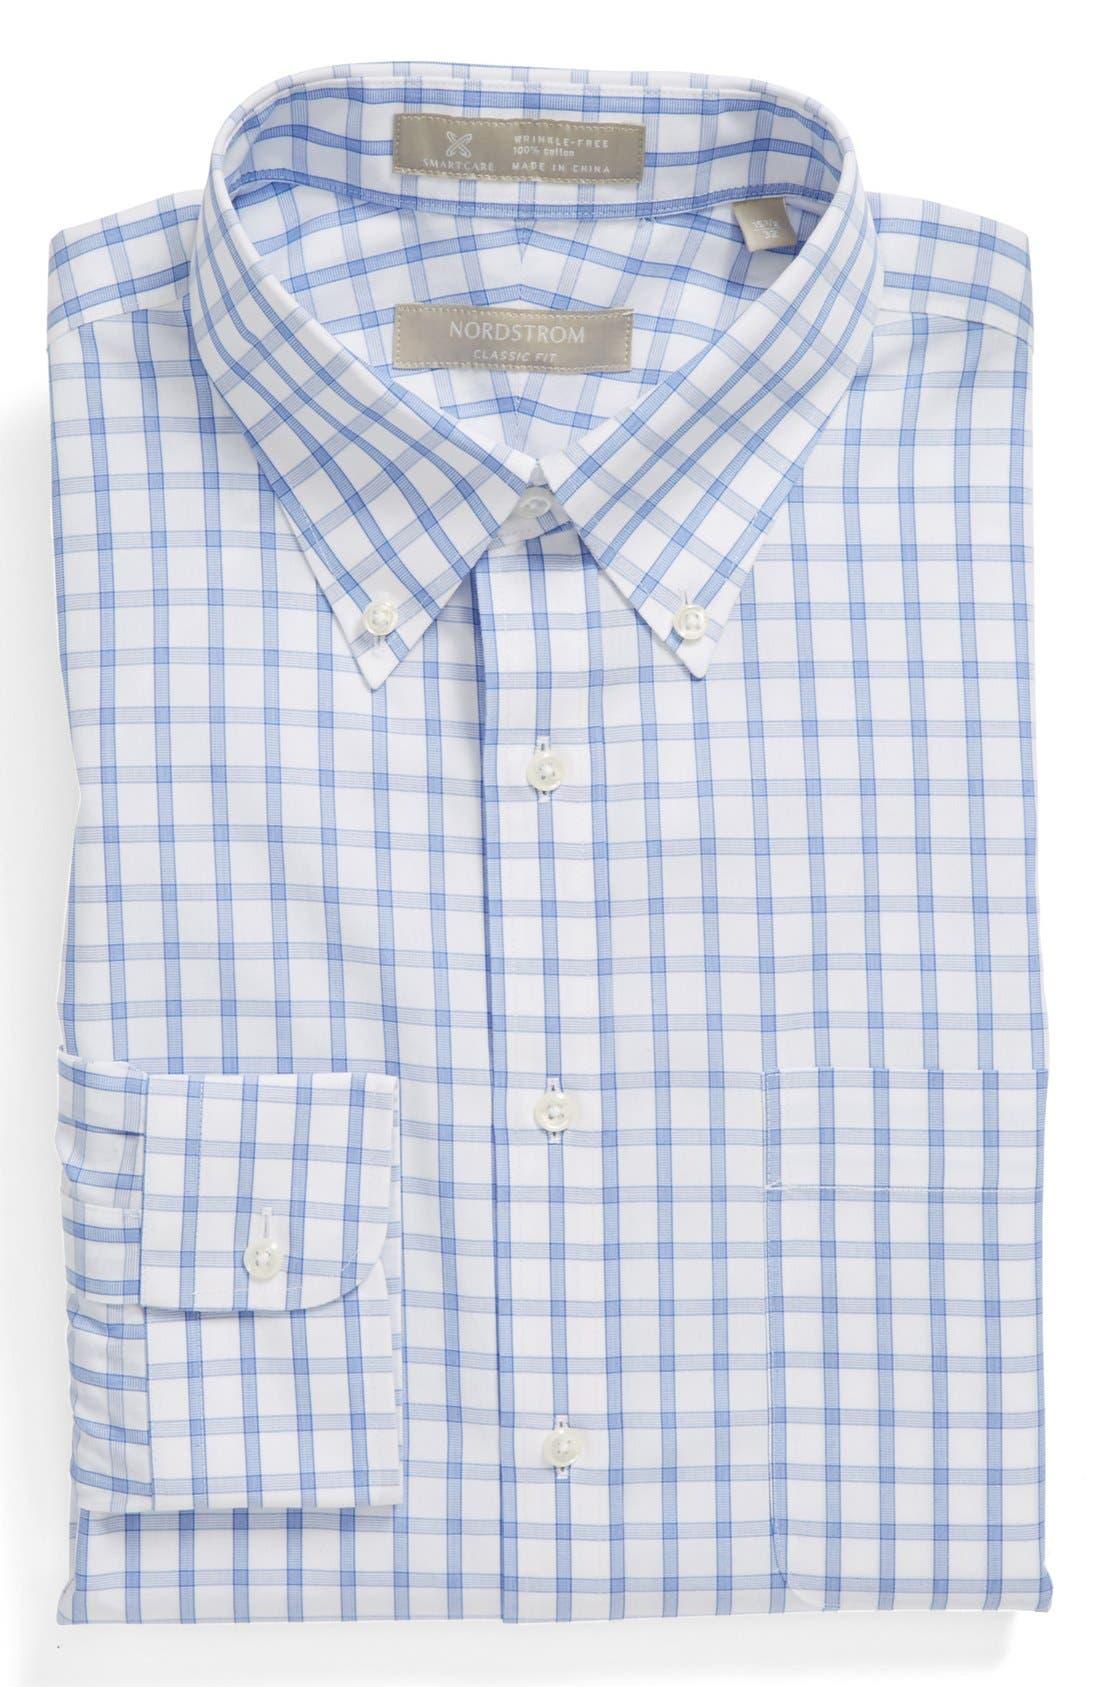 Alternate Image 1 Selected - Nordstrom Smartcare™ Wrinkle Free Classic Fit Dress Shirt